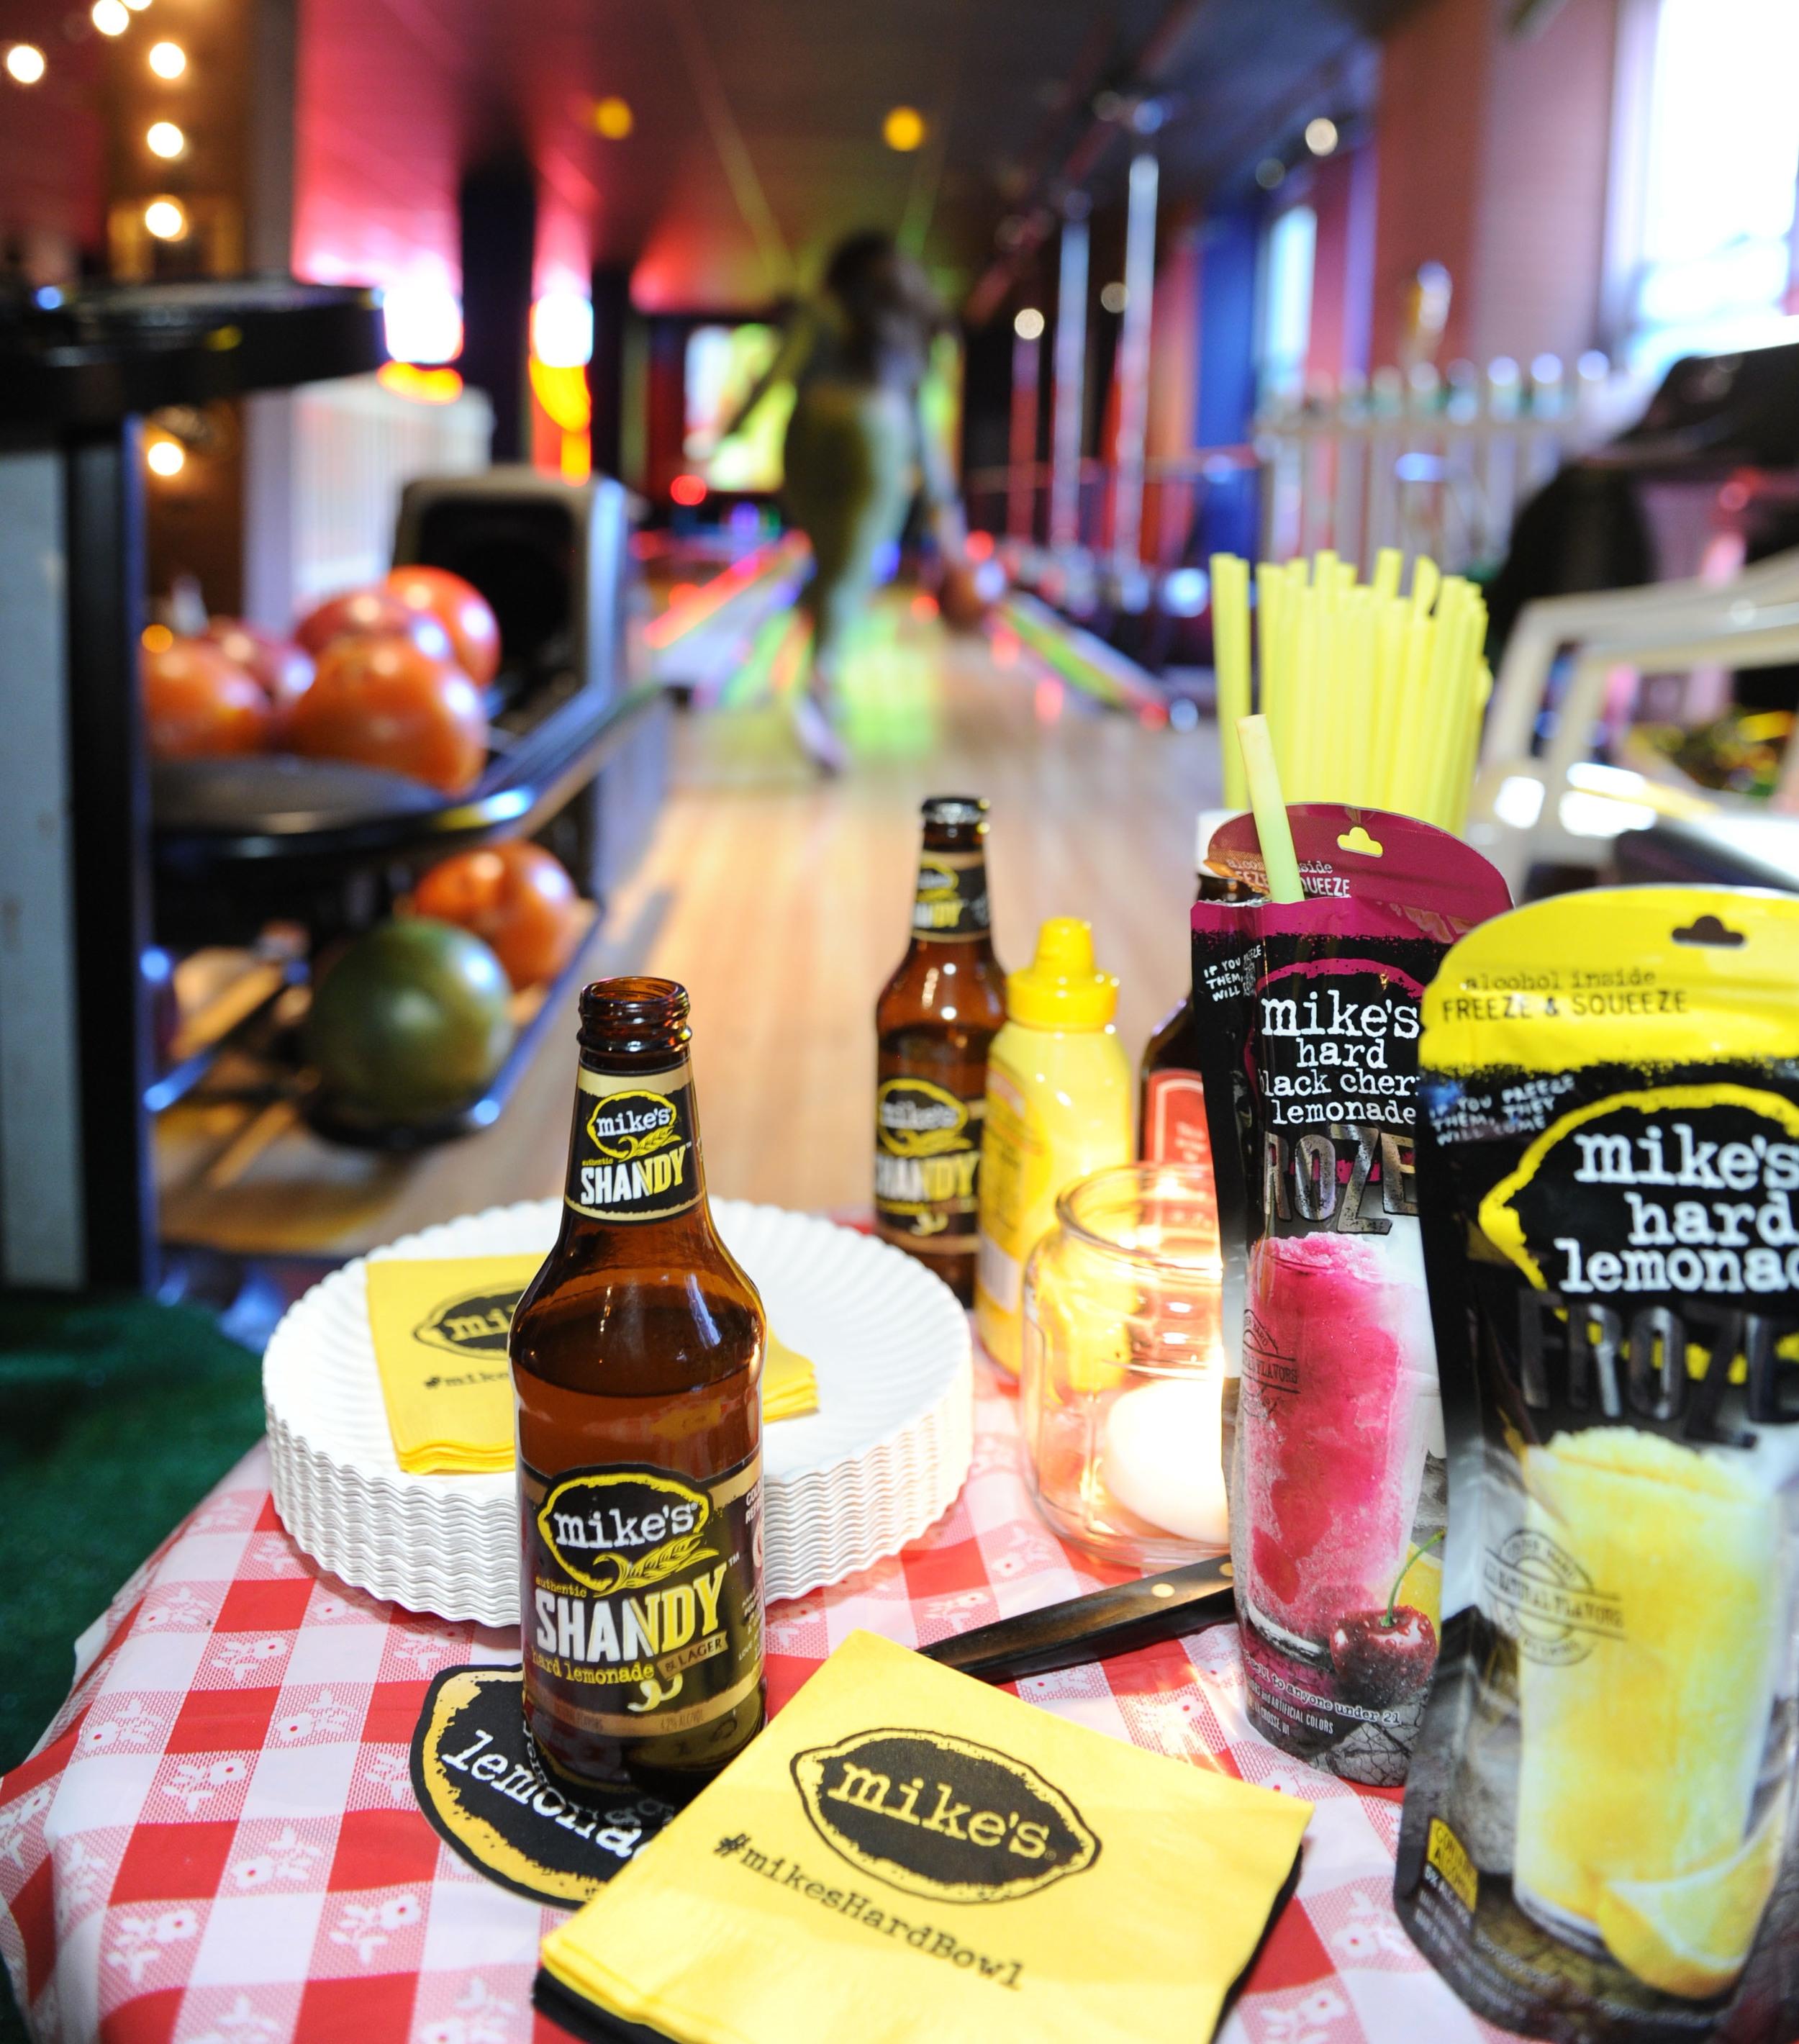 mikes-hard-lemonade-bowl-in-nyc-april-2013_15932330015_o.jpg